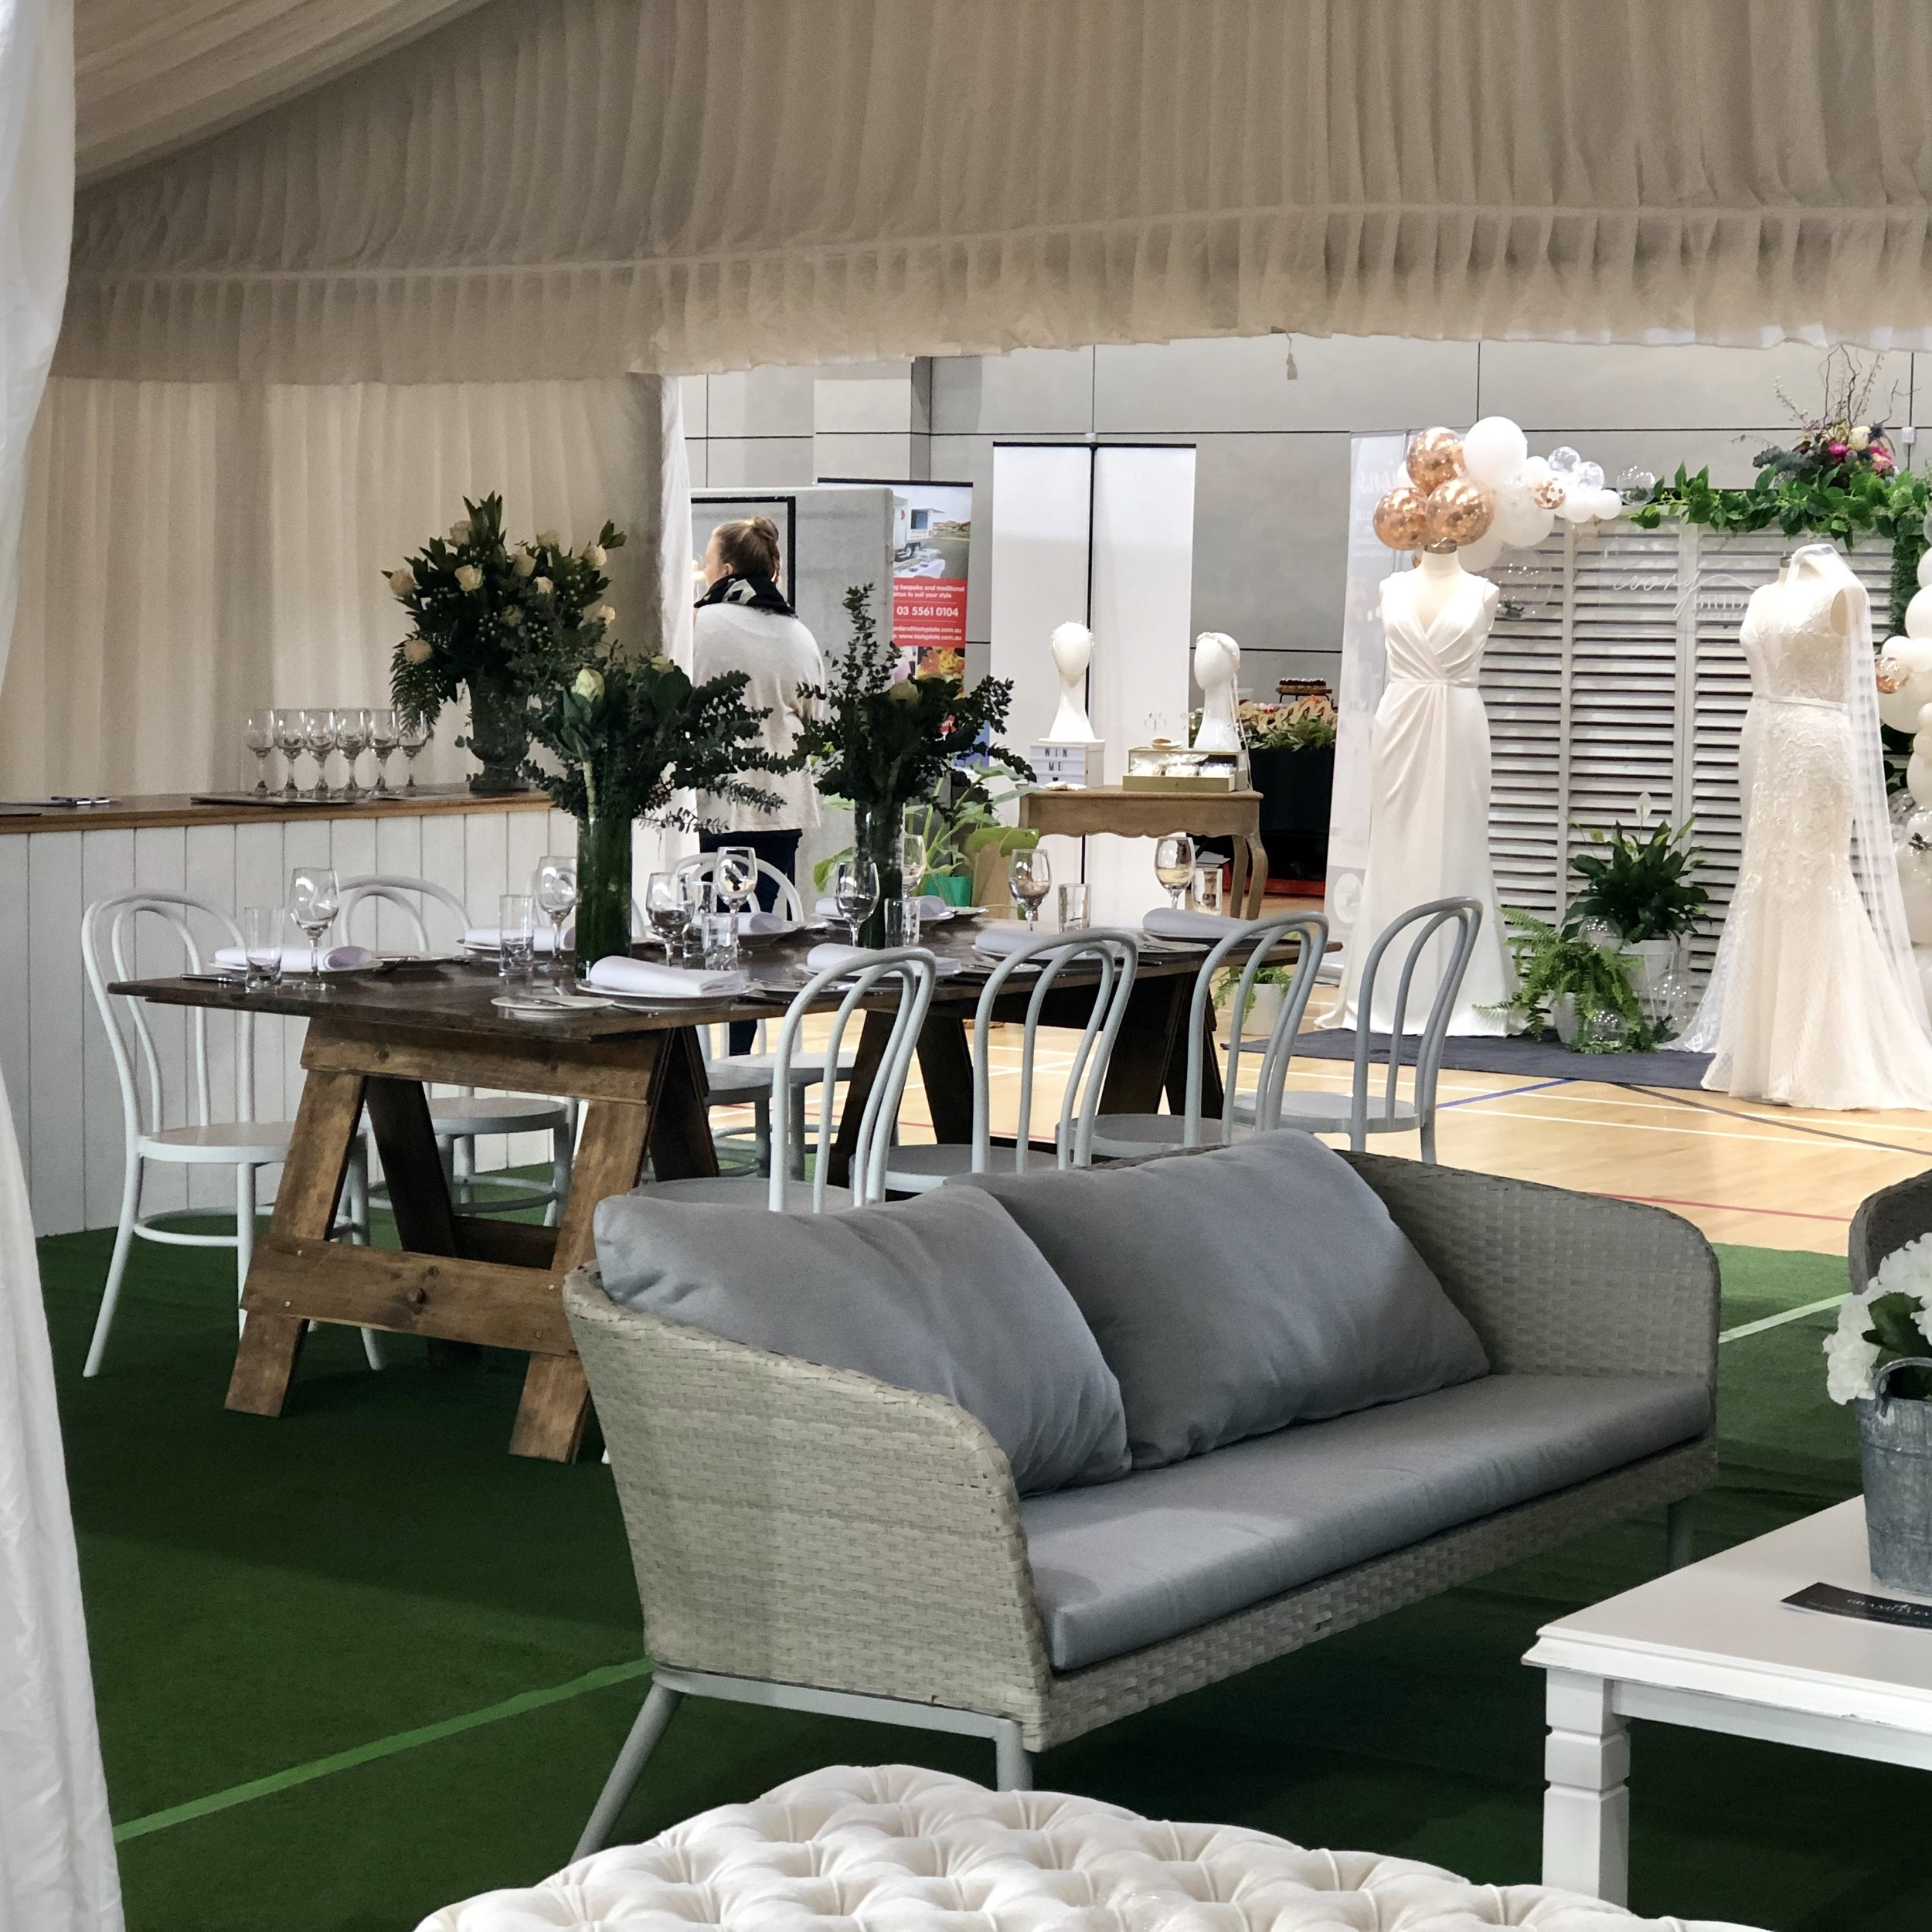 Warrnambool Bridal Expo - Grand Events Furniture Hire